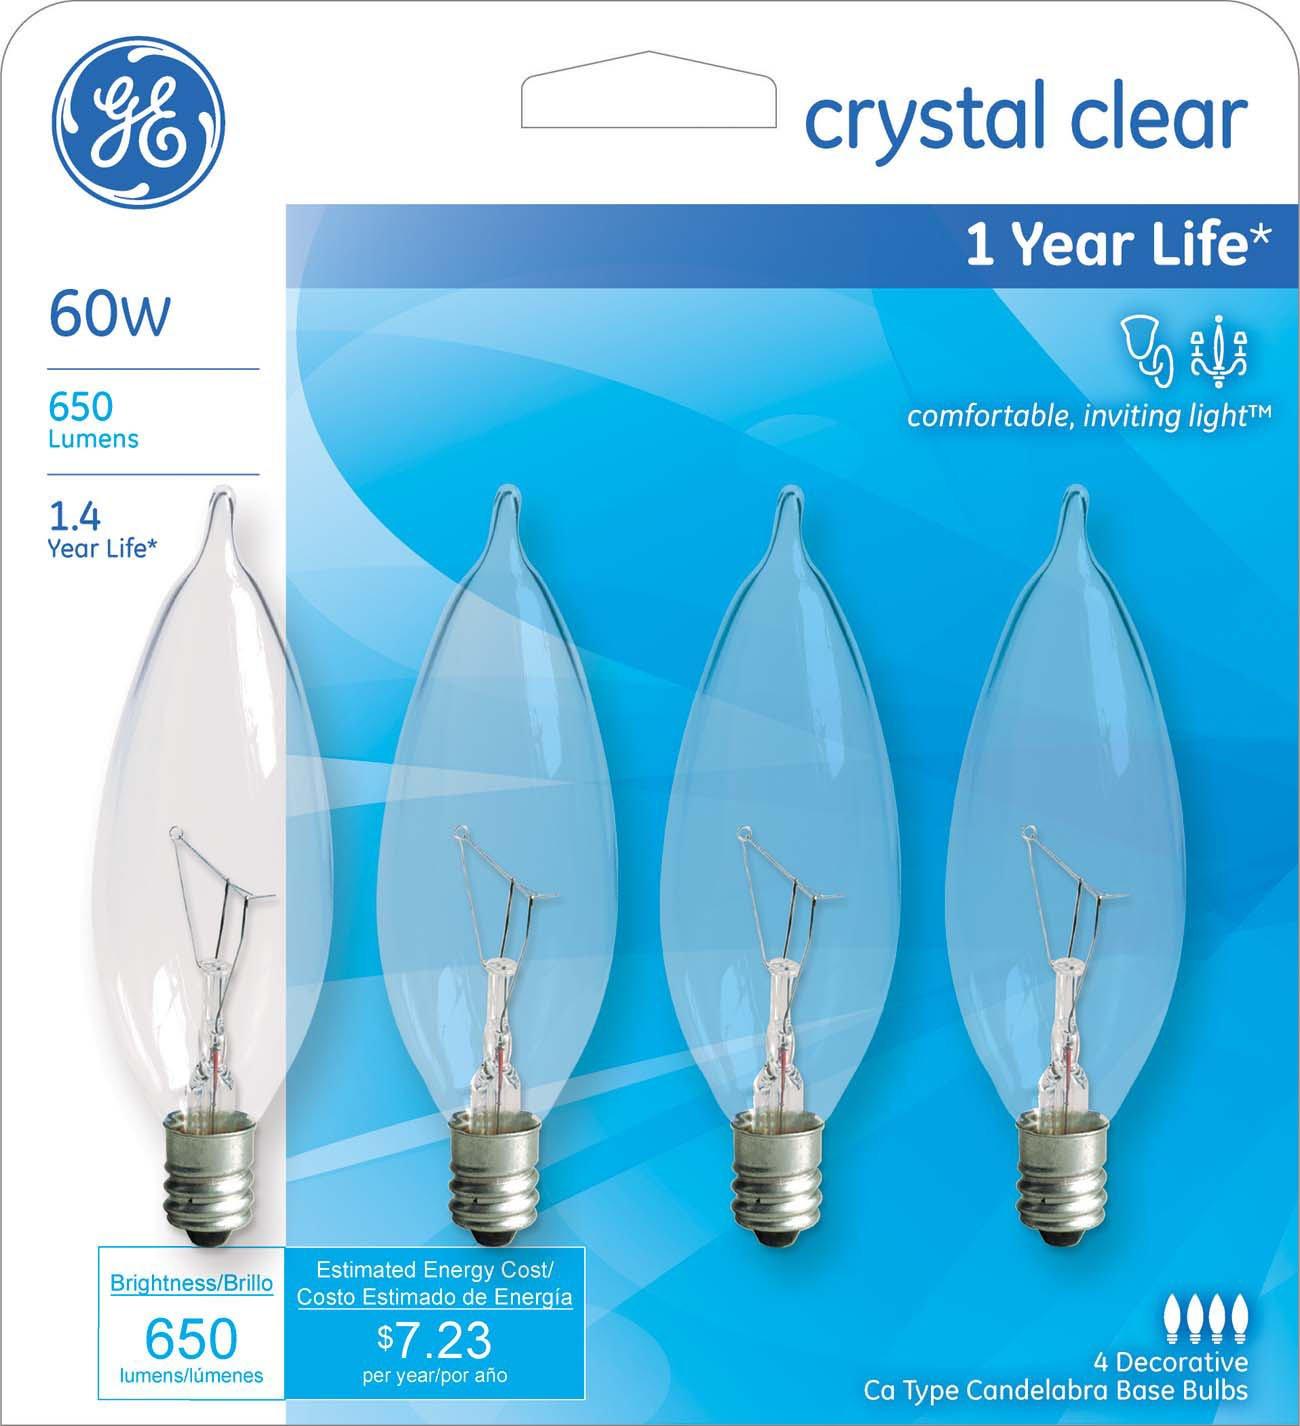 Ge lighting crystal clear 76239 60 watt 650 lumen bent tip light ge lighting crystal clear 76239 60 watt 650 lumen bent tip light bulb with candelabra base 16 pack incandescent bulbs amazon arubaitofo Gallery